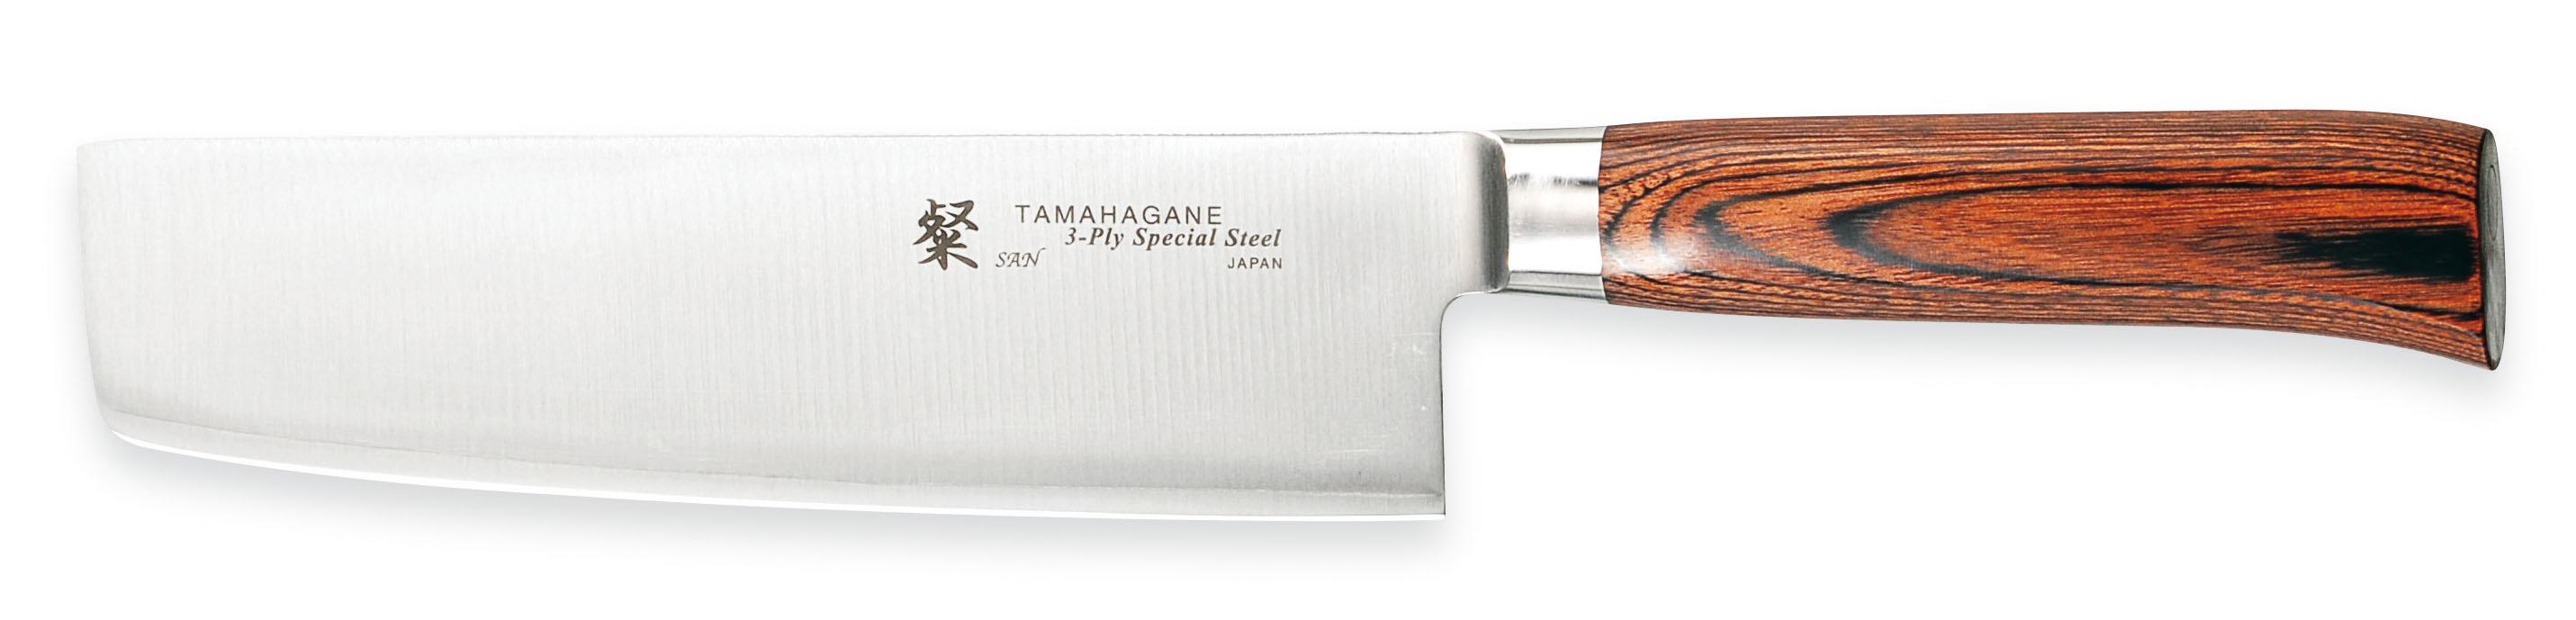 Tamahagane SAN Grønnsakskniv 18 cm